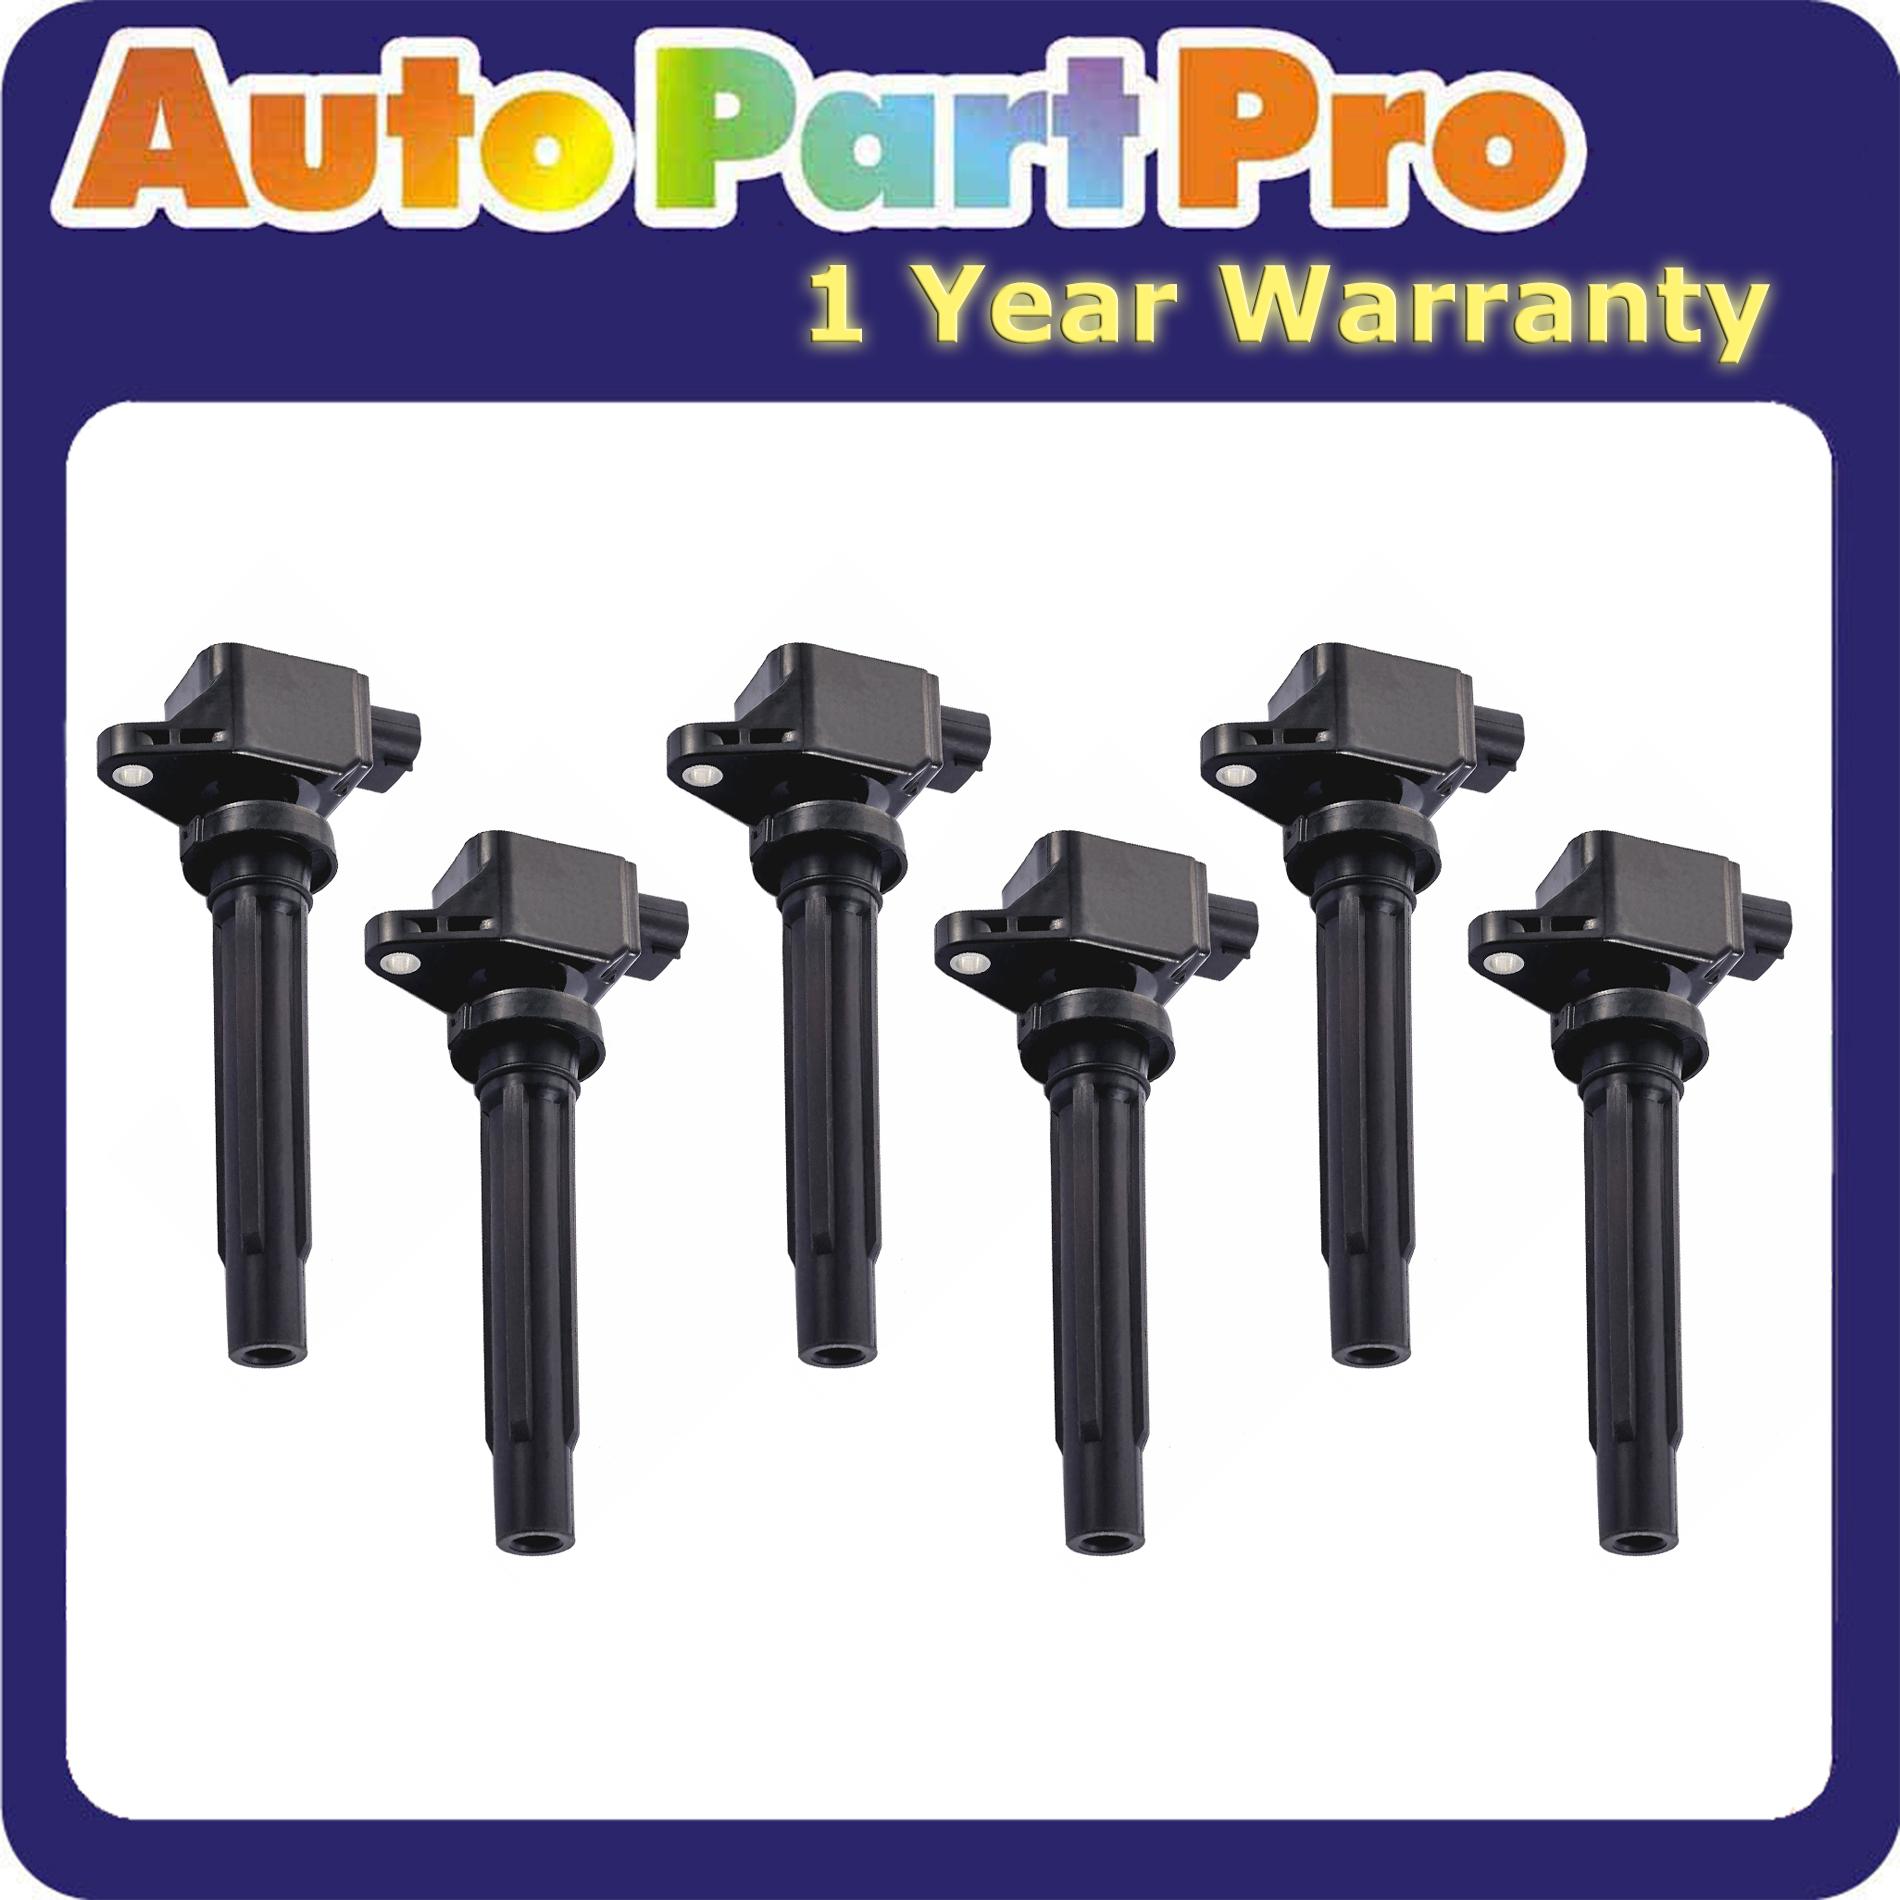 1994-1997 SL320 1990-1992 500SL Bosch 36010960 QuietCast Premium Disc Brake Rotor For Mercedes-Benz: 1990-1992 300SL 1994-1997 SL500; Rear